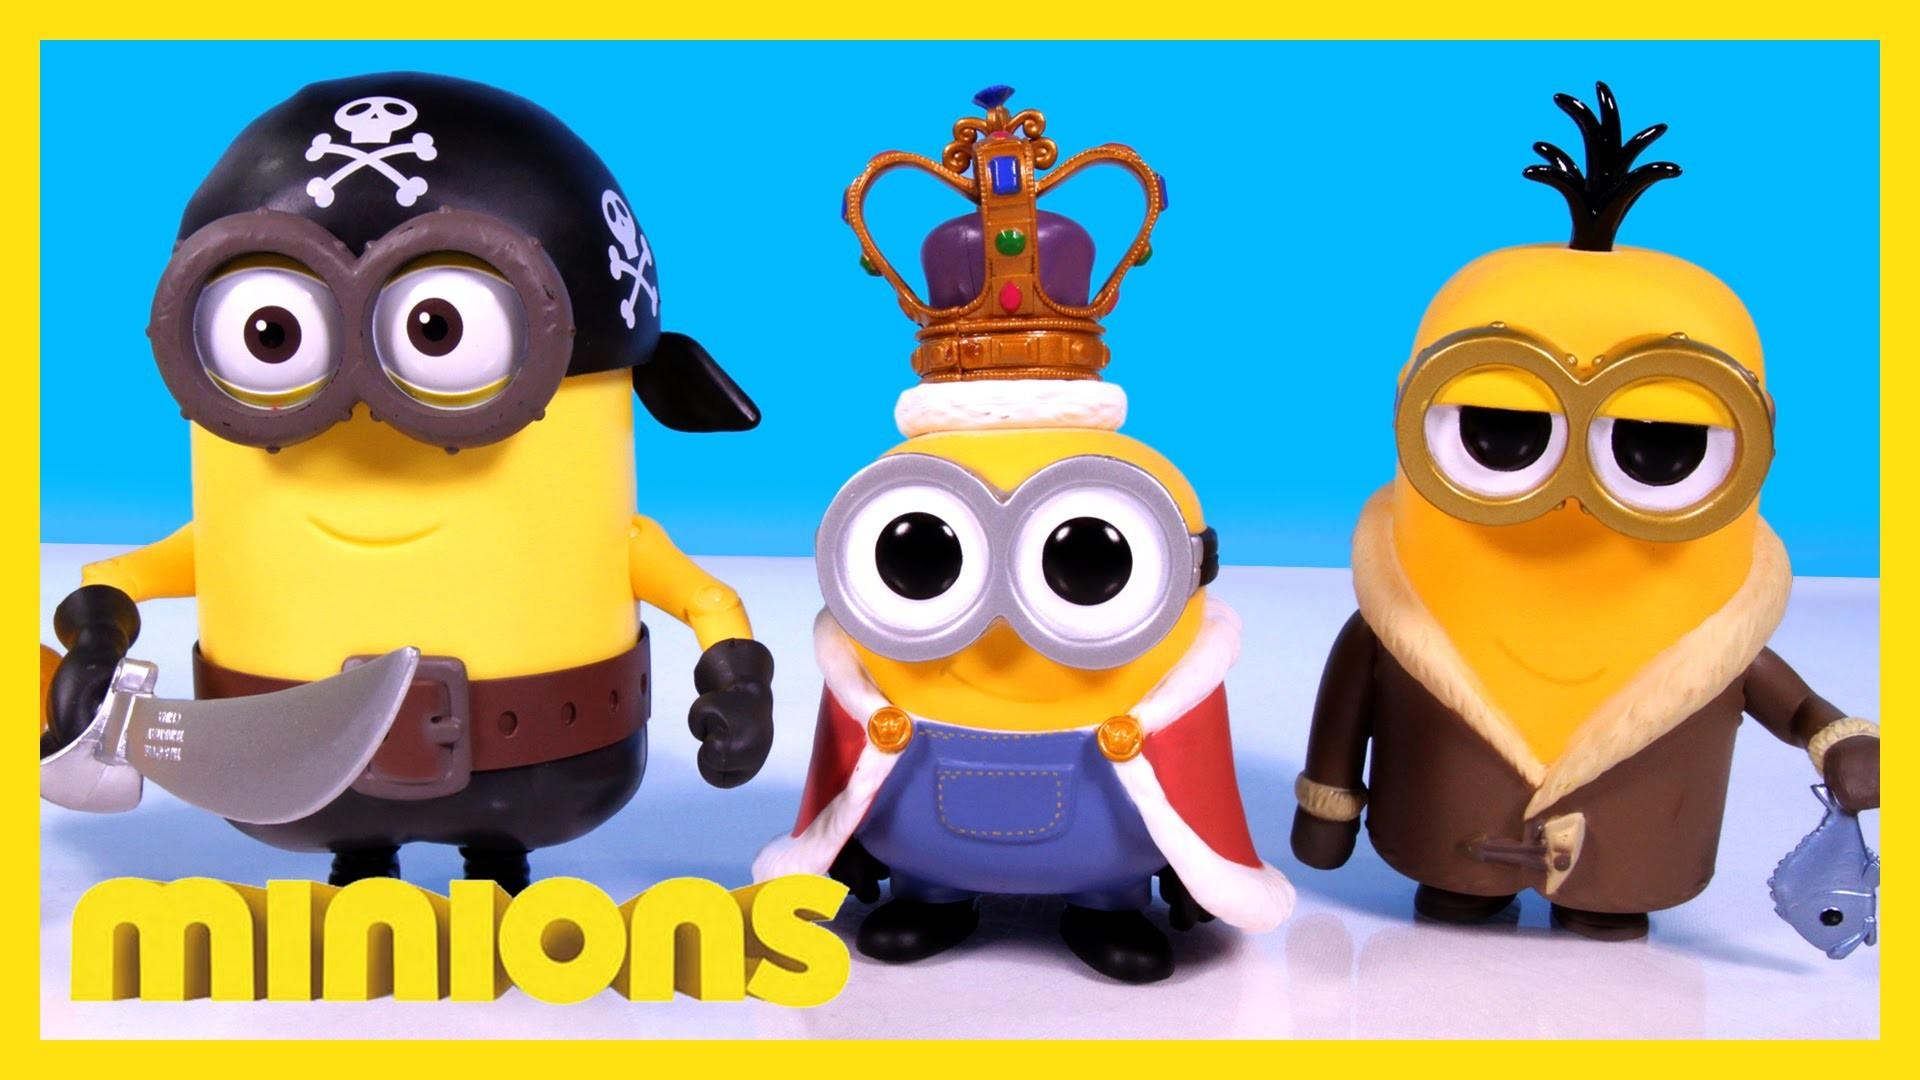 Minions Toys 2015 Build-A-Minion Pirate/Cro-Minion & FUNKO POP King Bob &  Bored Silly Kevin – YouTube